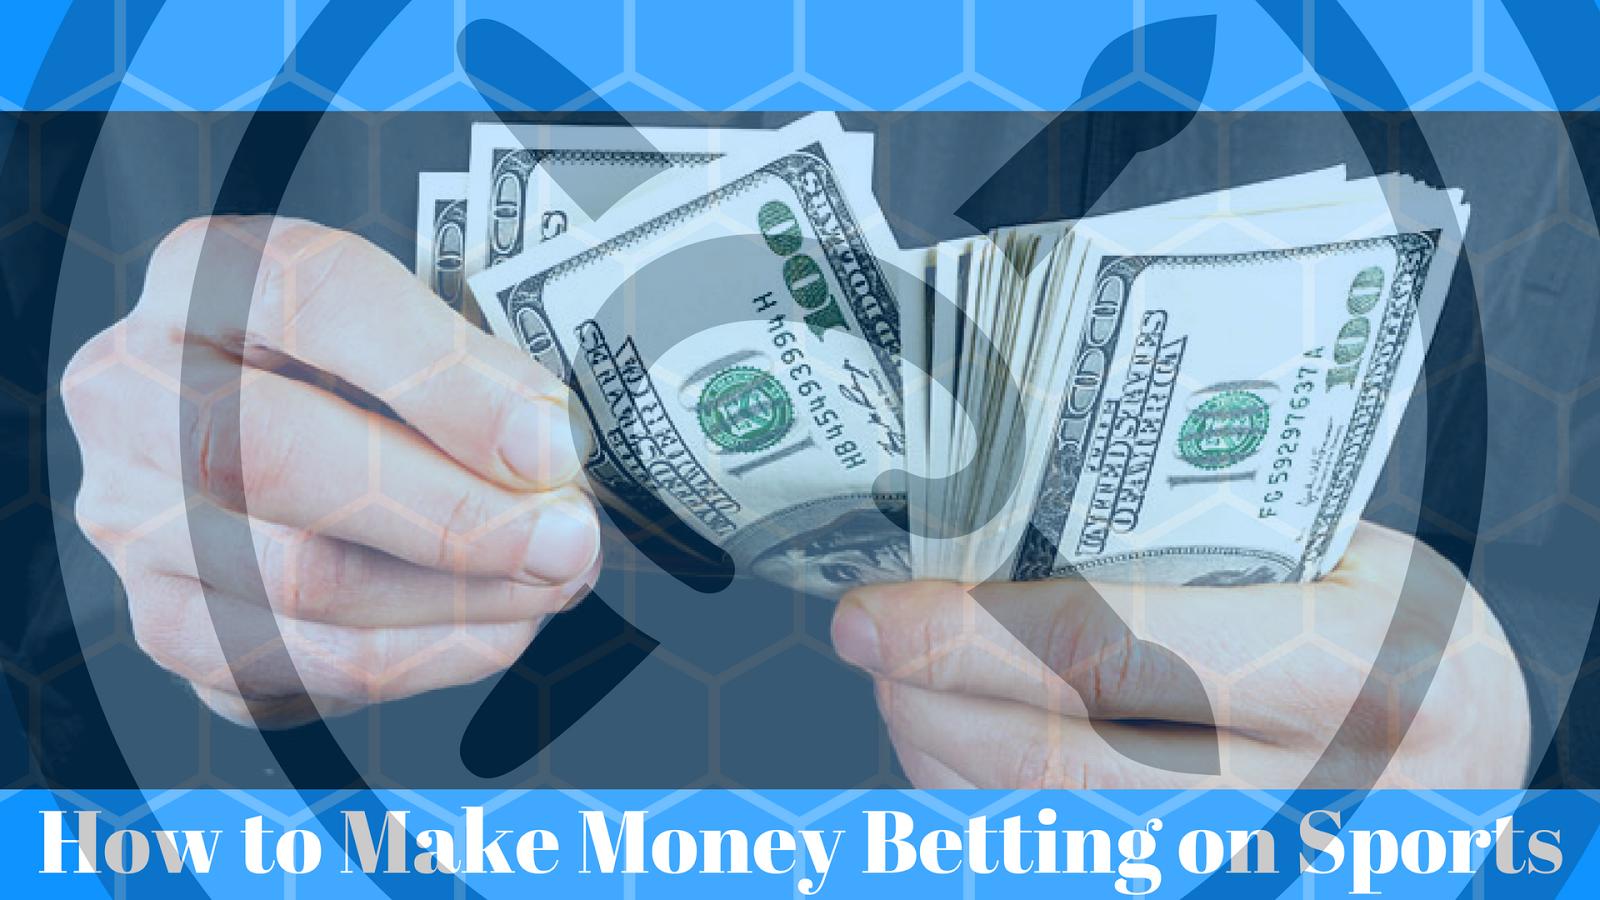 Make money sports betting online insidebitcoins seoul national university